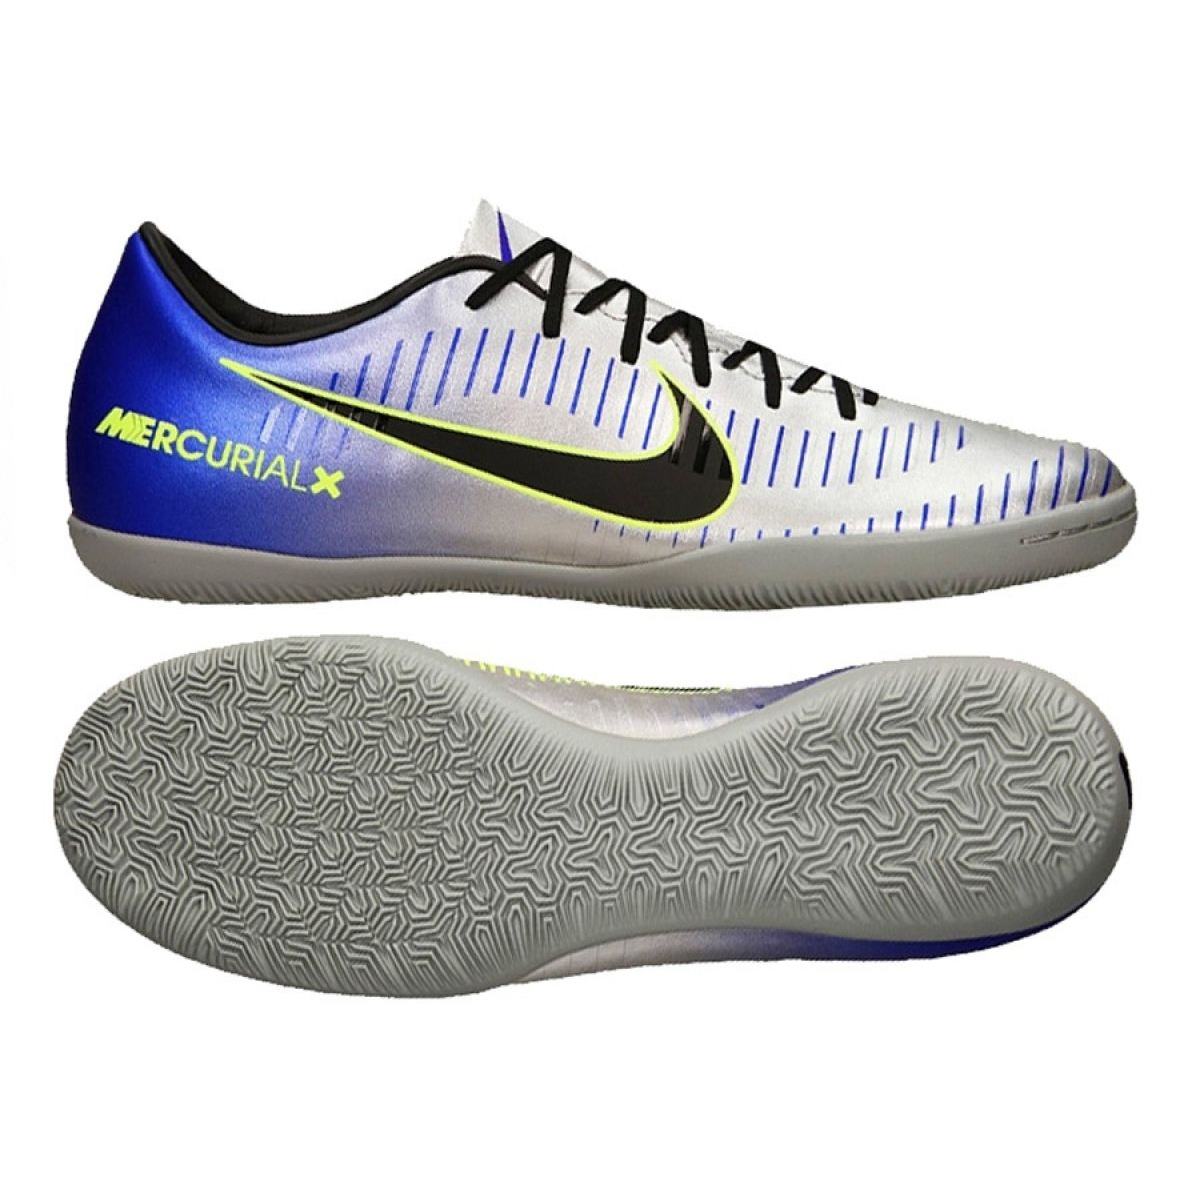 low priced 0f6f6 3c1d2 Indoor shoes Nike MercurialX Victory Vi Neymar Ic M 921516-407